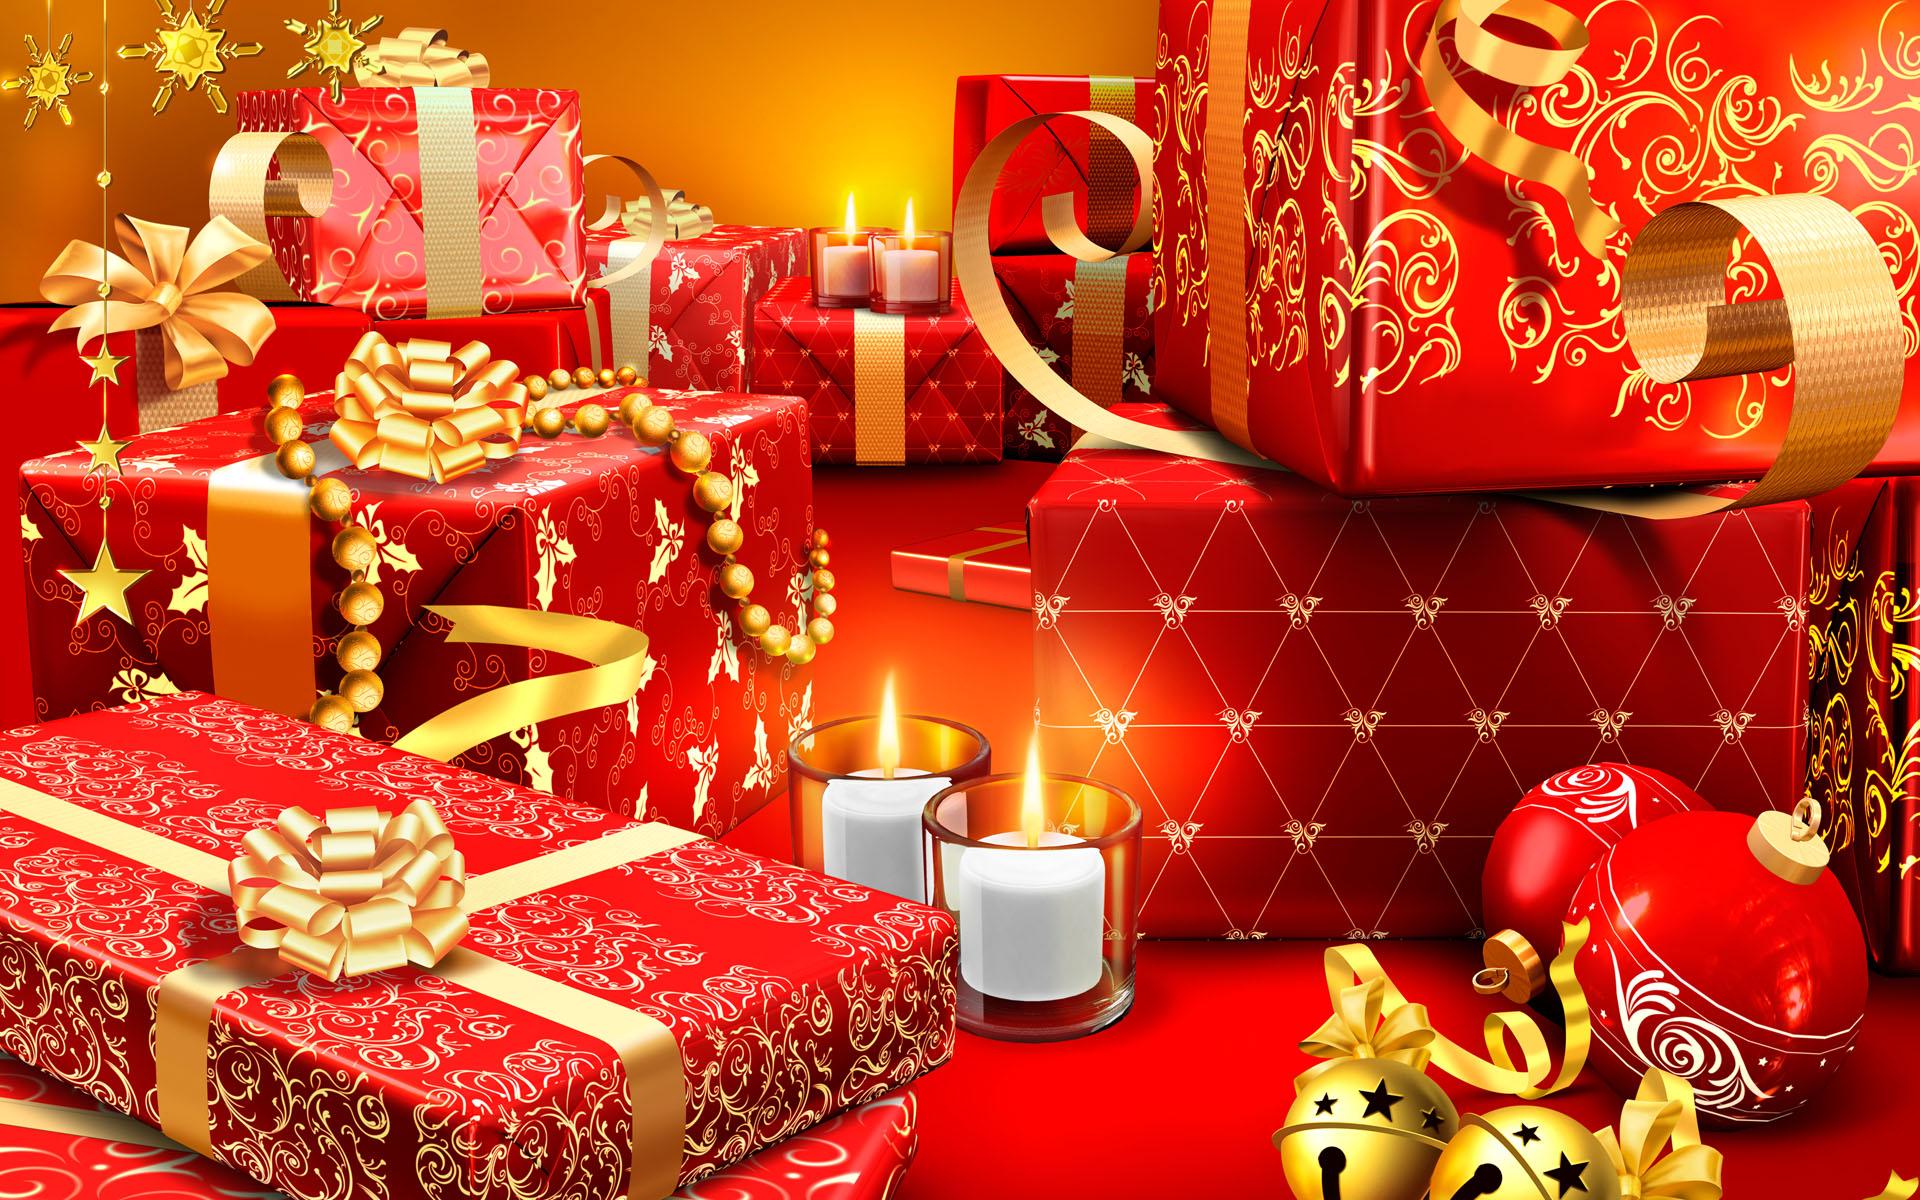 HD Wallpapers Christmas Presents